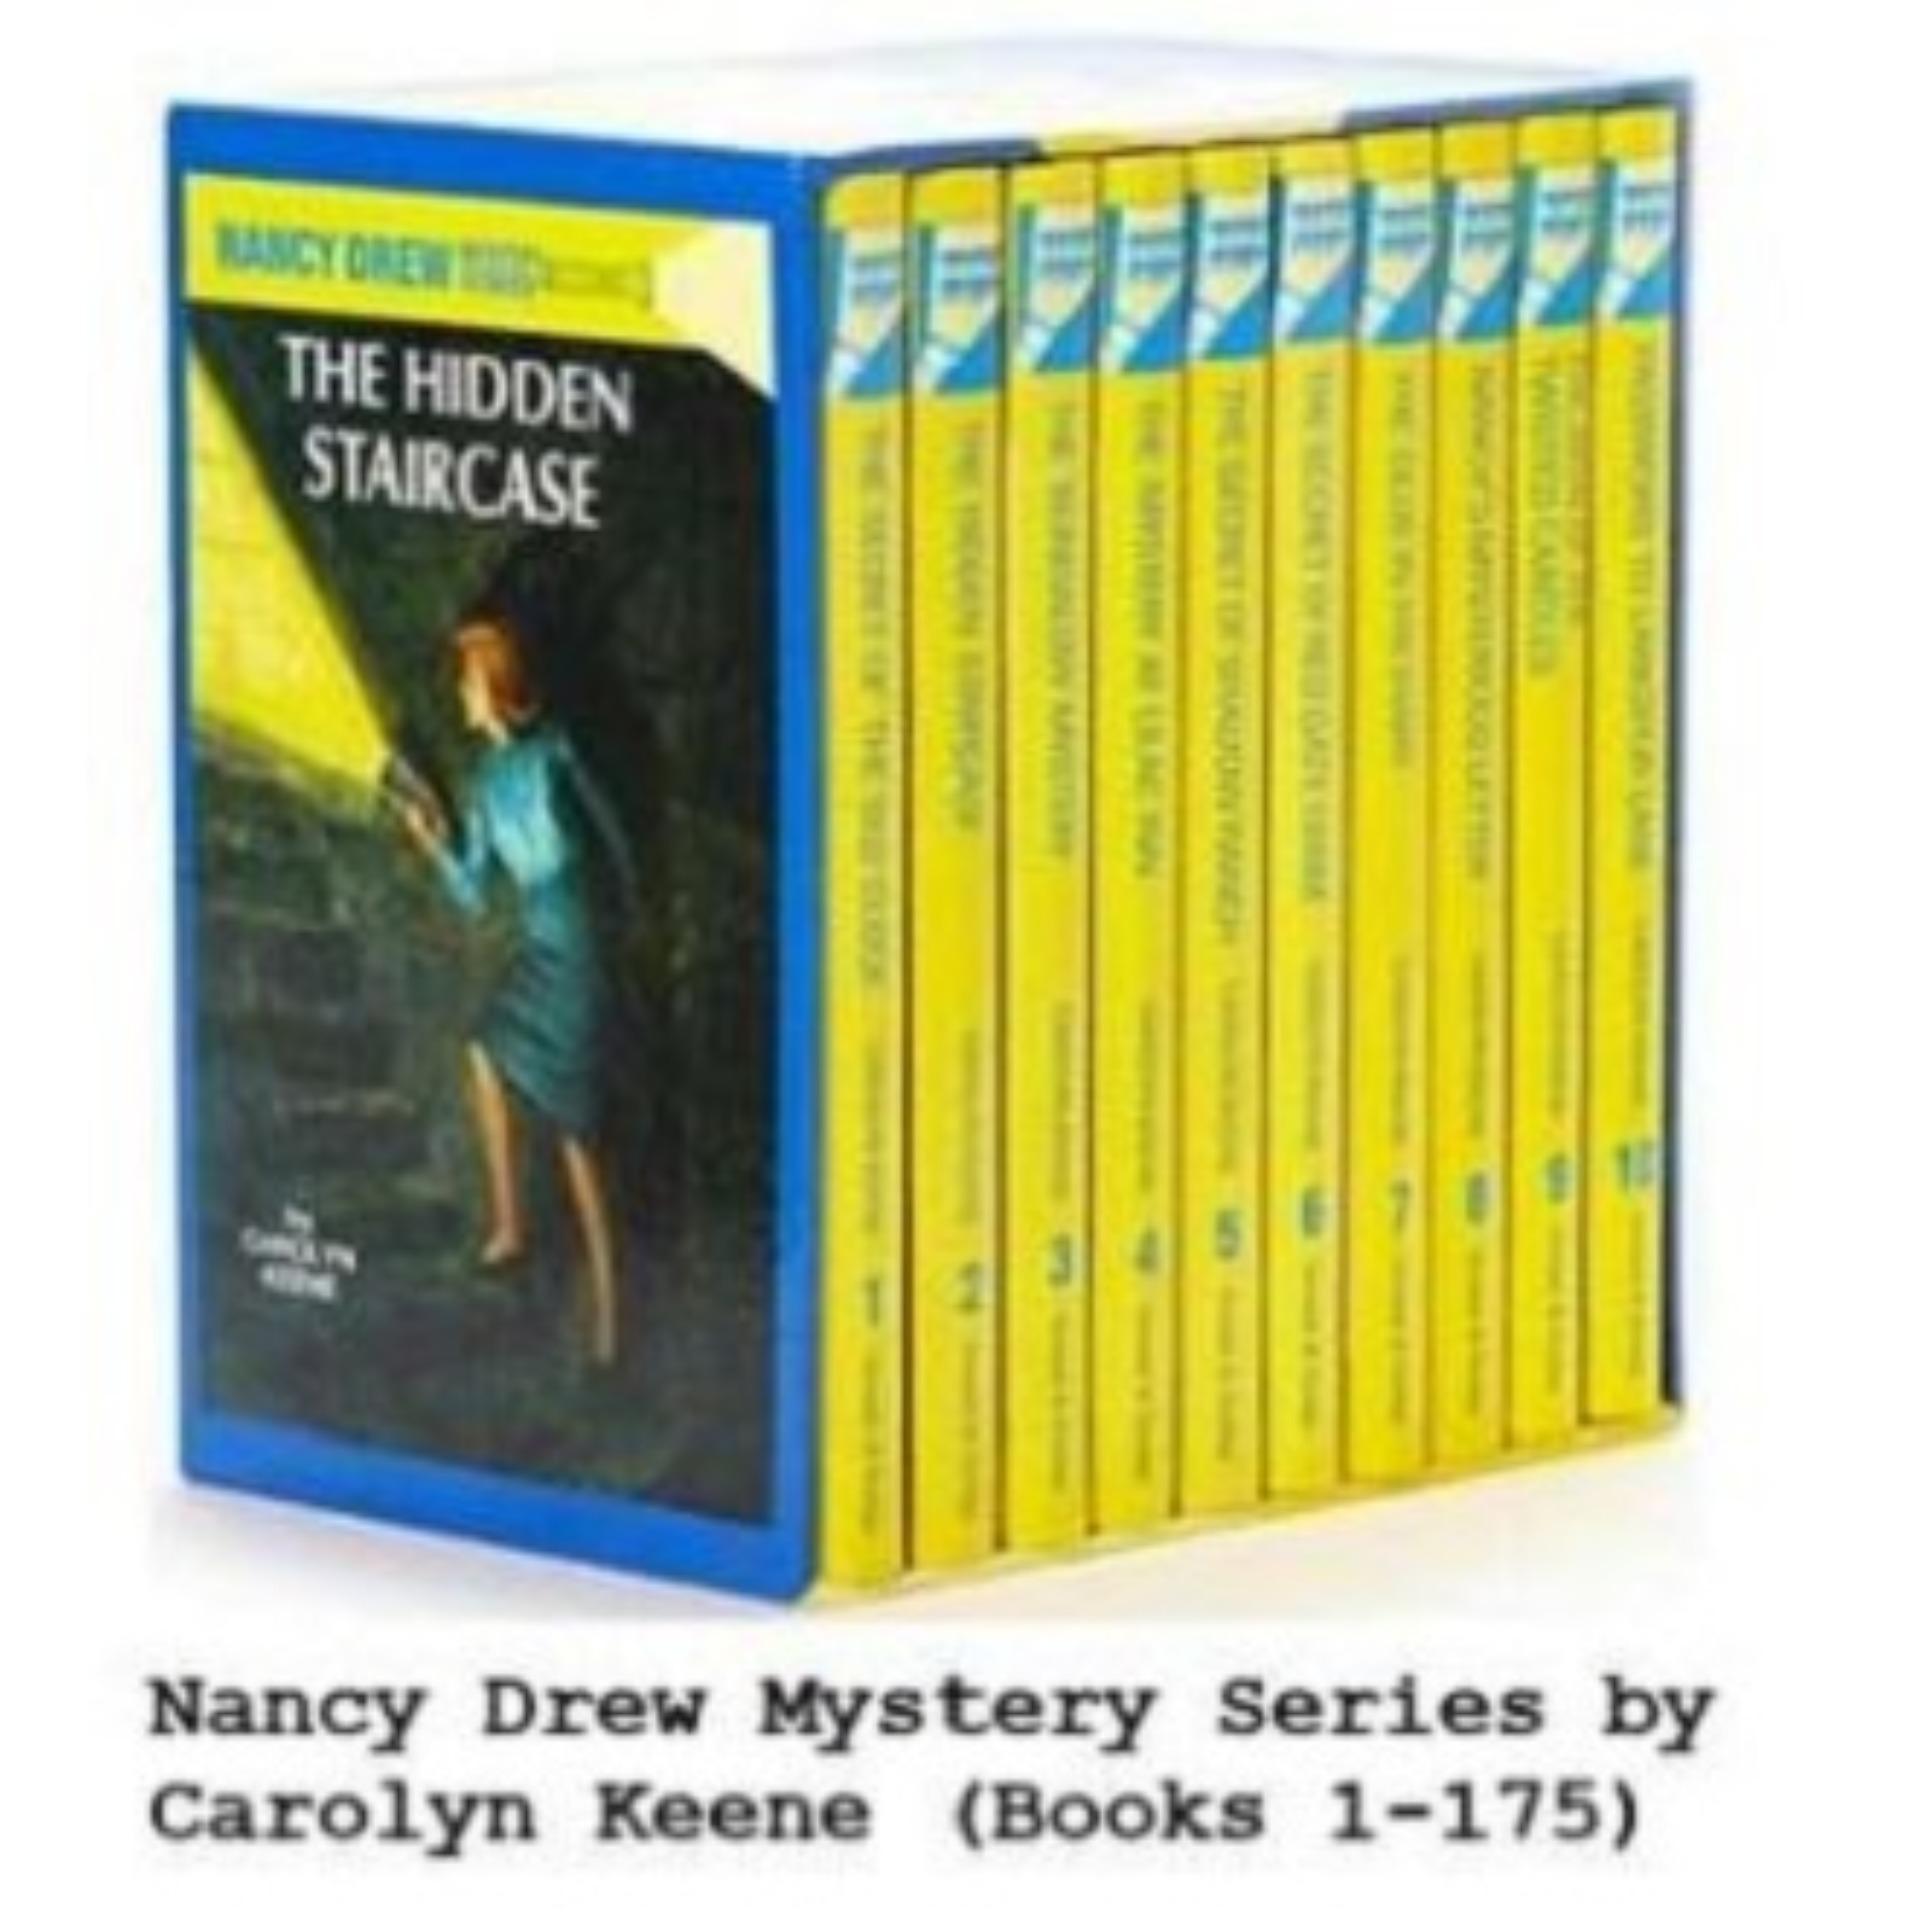 Nancy Drew Mystery Series 1-175 by Carolyn Keene eBooks (epub)